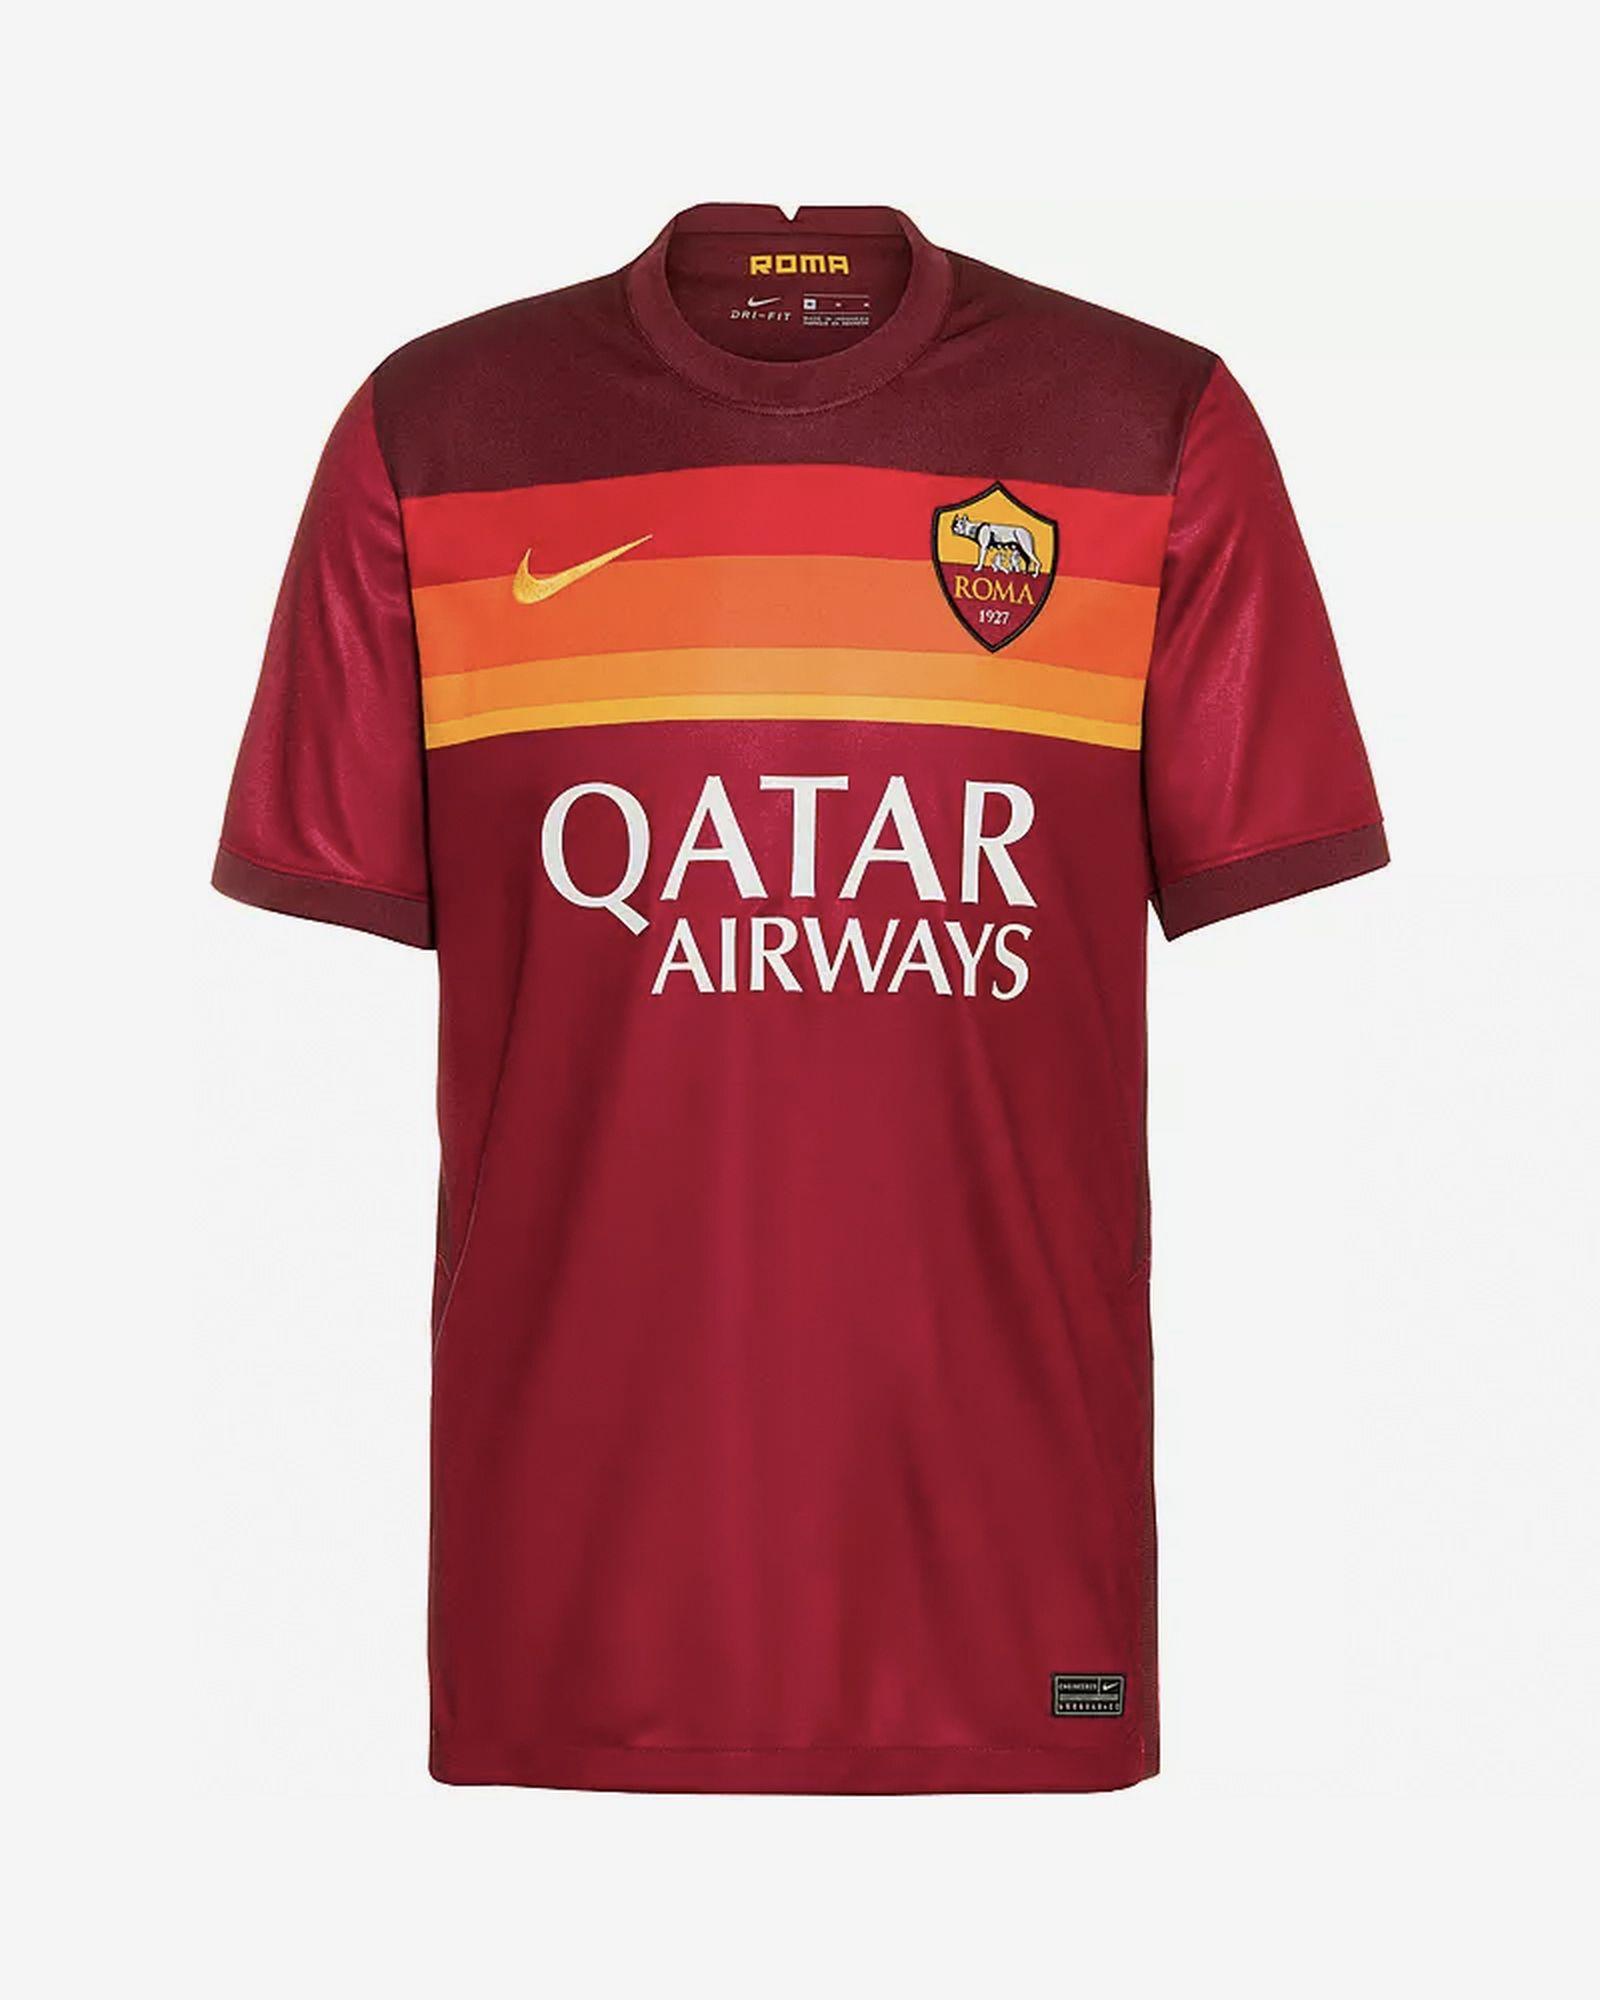 football-shirts-2020-review-08